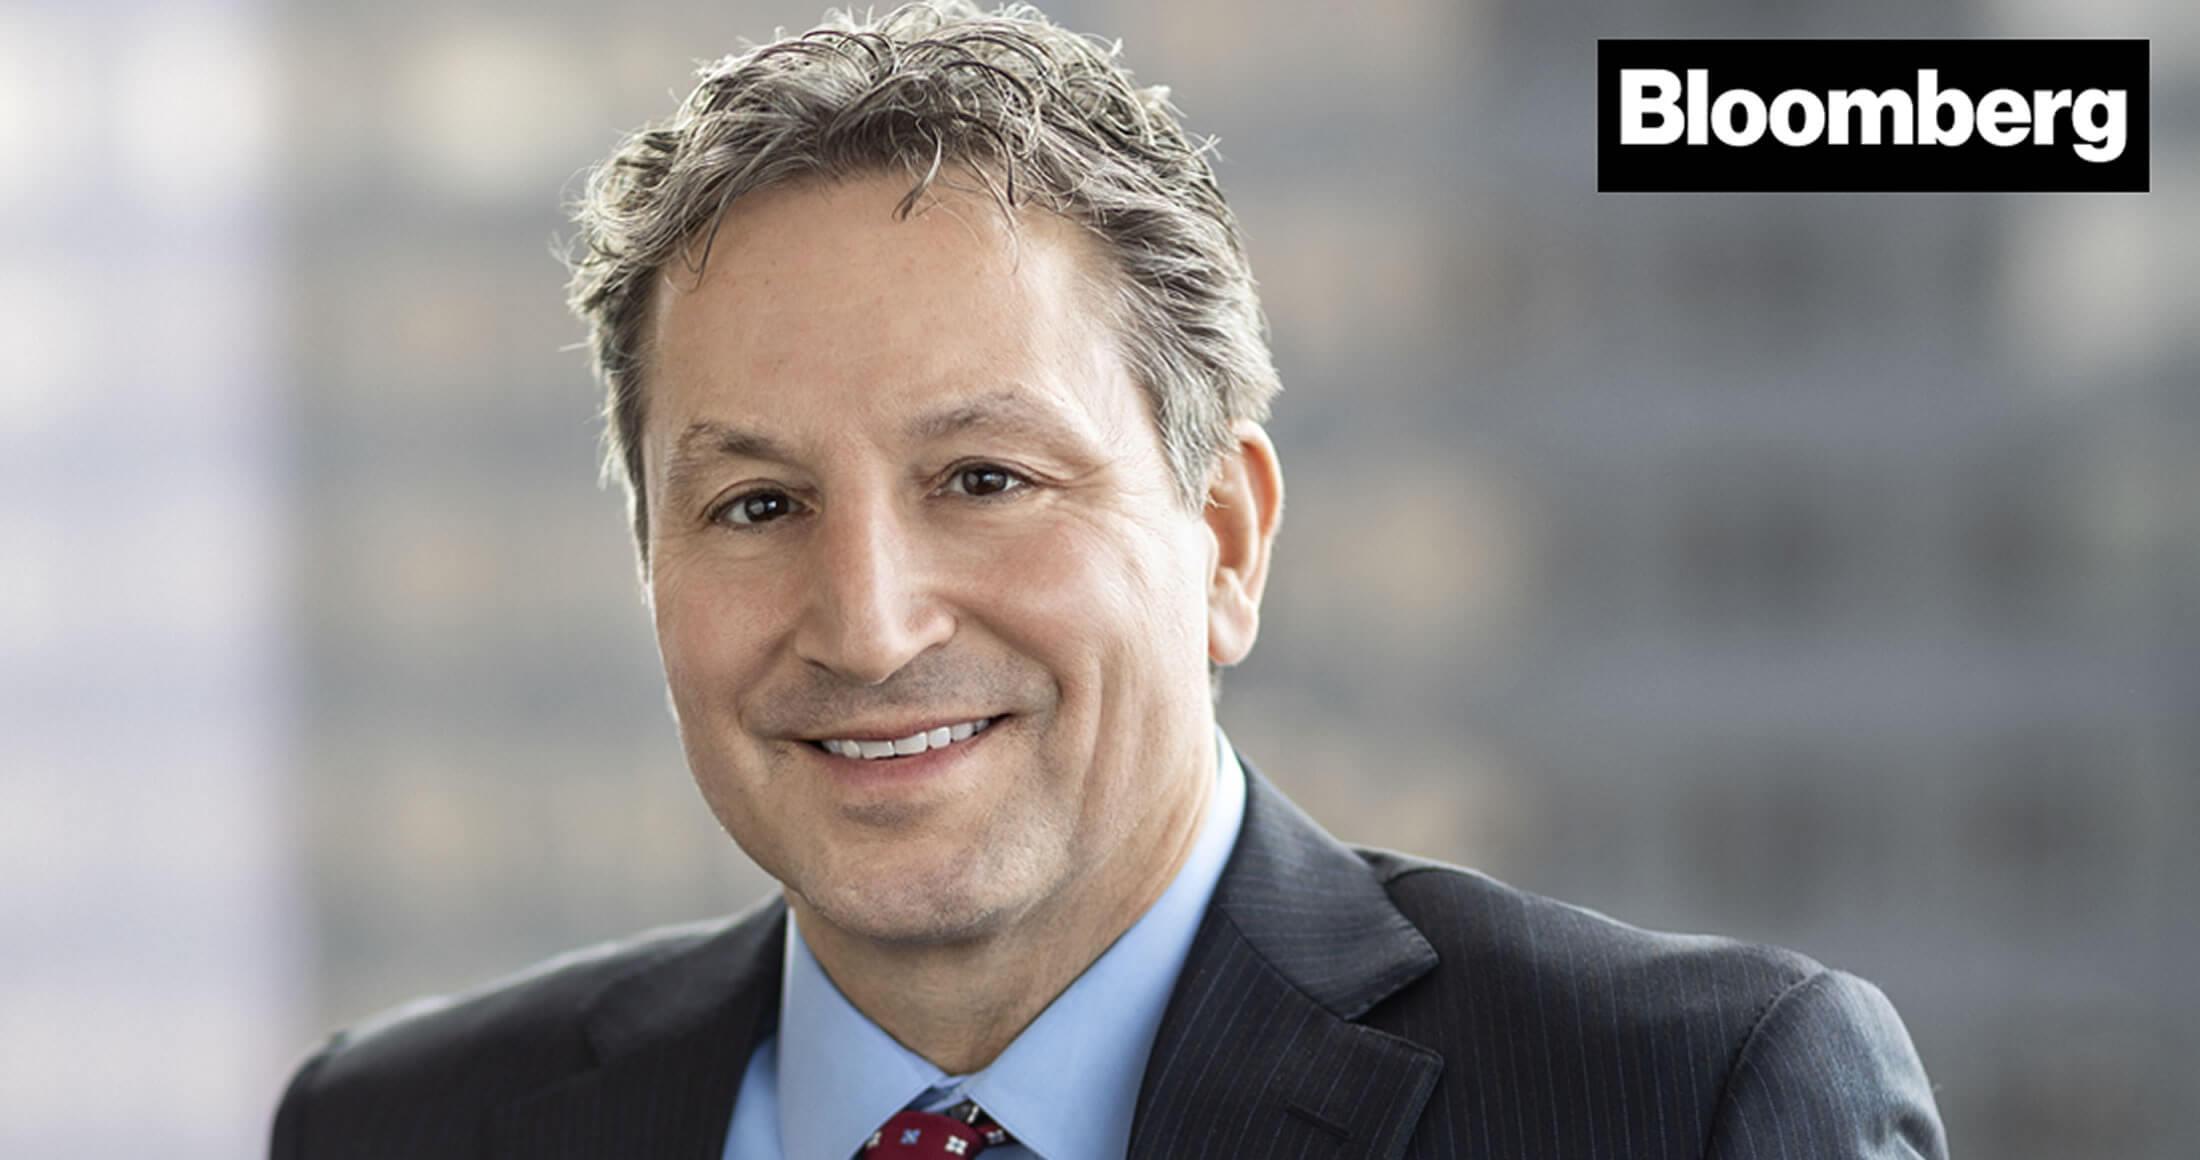 David Herro- Portfolio Manager- Featured on Bloomberg Headshot